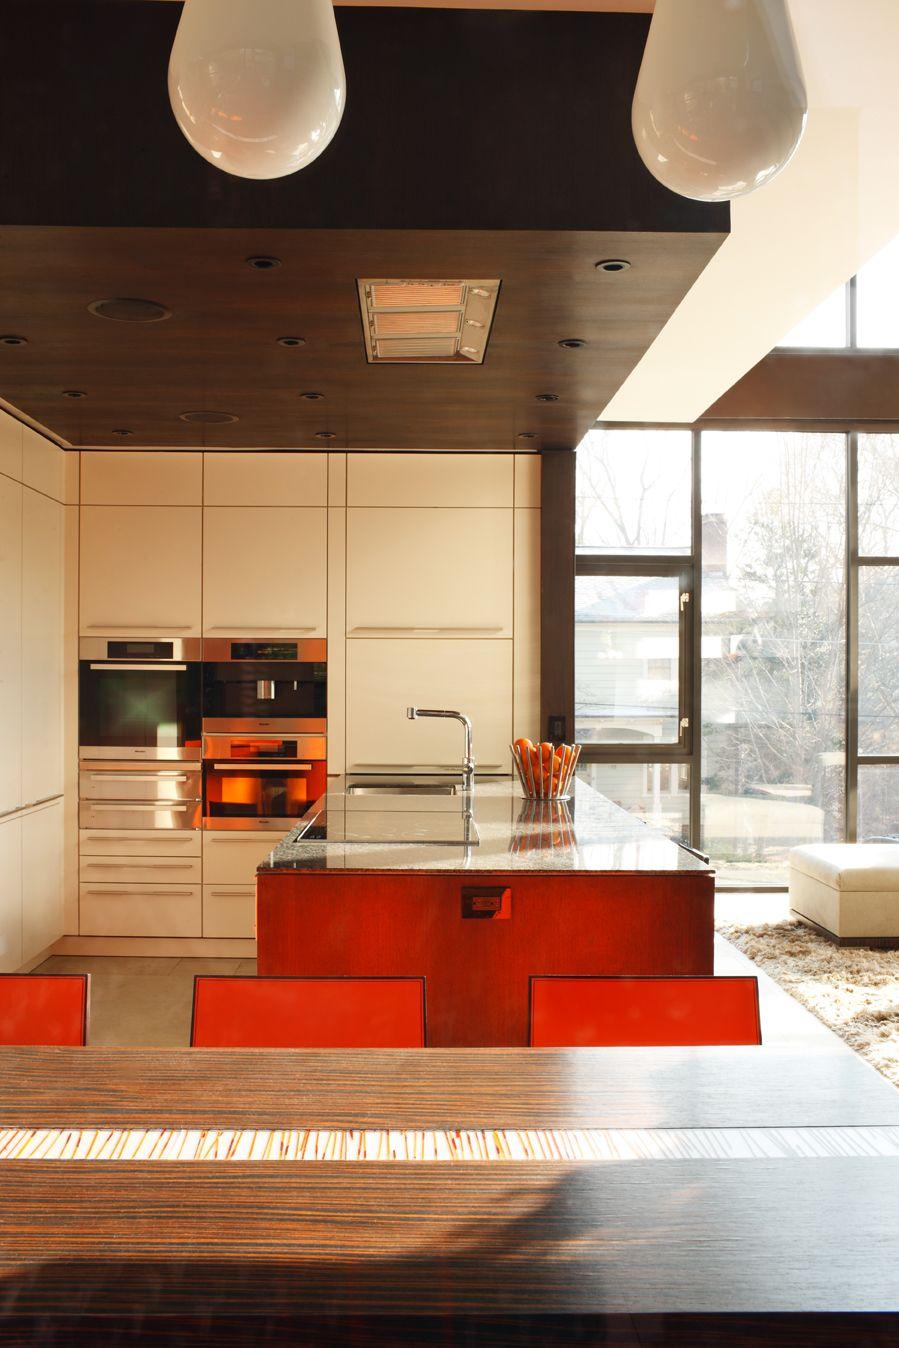 Kitchen in modern house in Ansley neighborhood - Atlanta ...